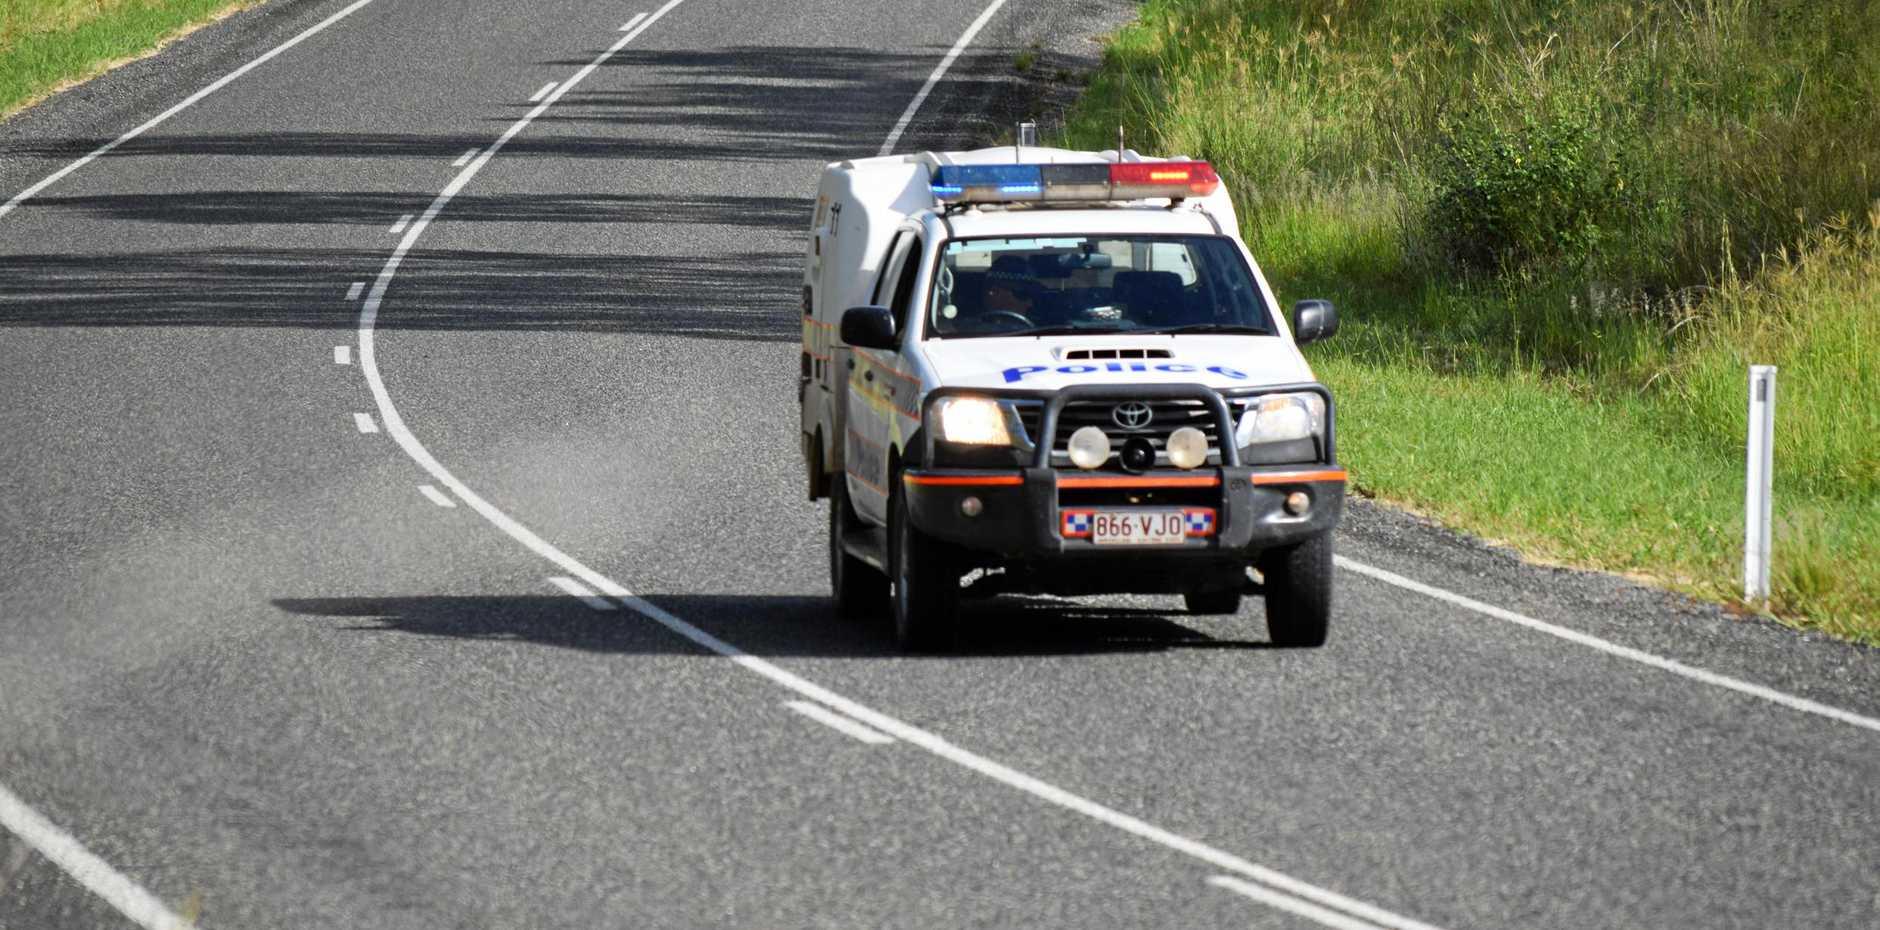 A police car speeds down the road.  Photo Tobi Loftus / Central & North Burnett Times